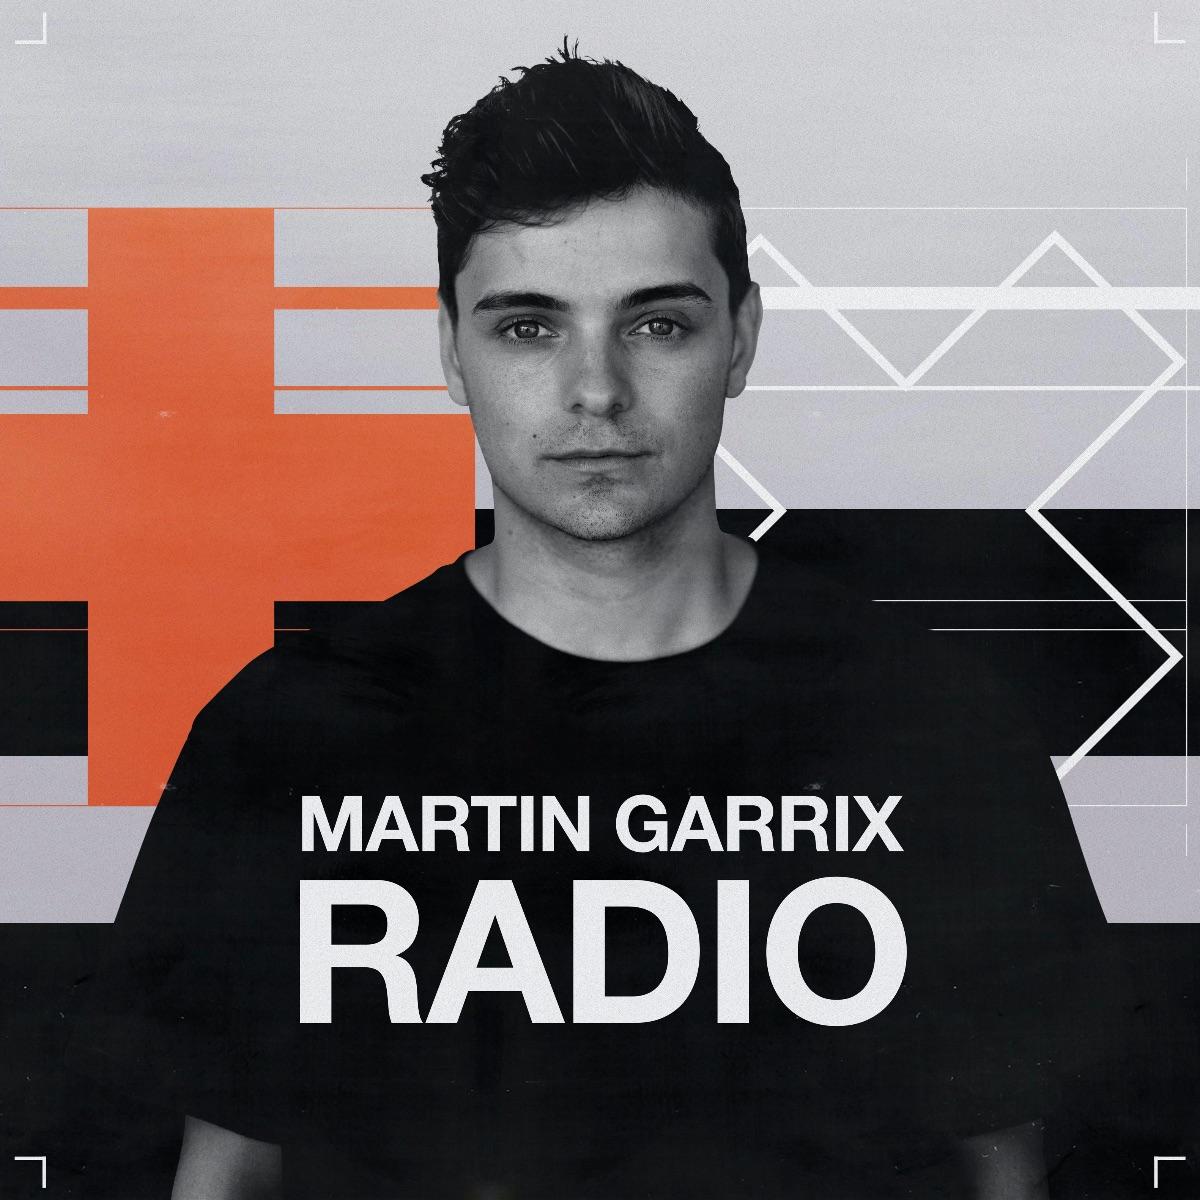 Martin Garrix Radio Show Expands To YouTube